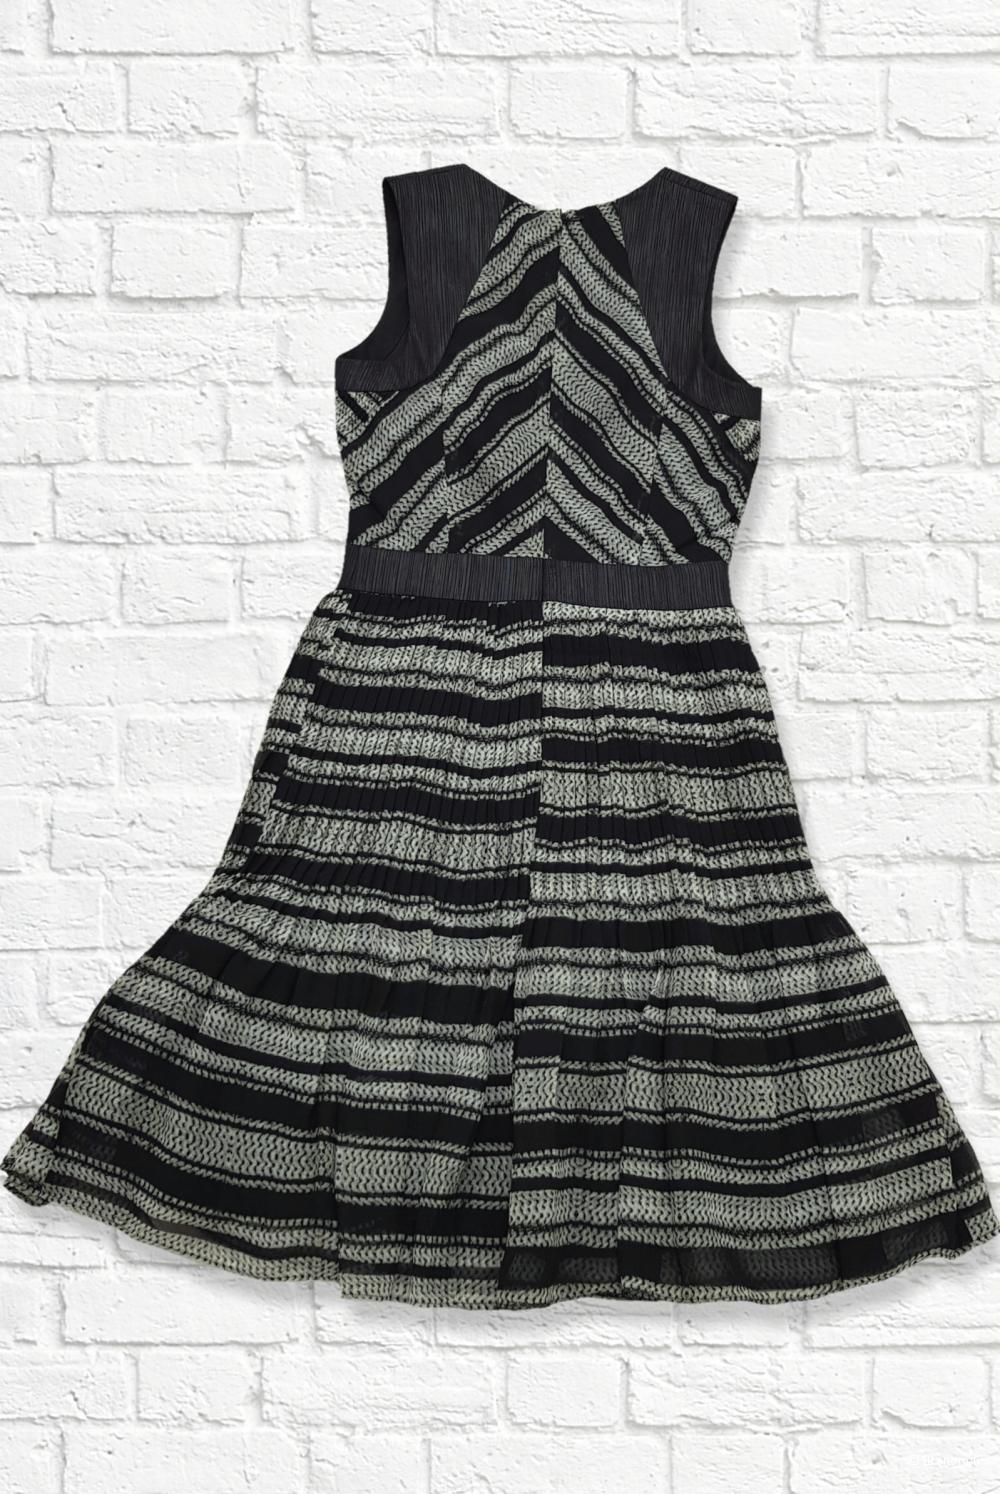 Платье. Armani exchange. 0/42